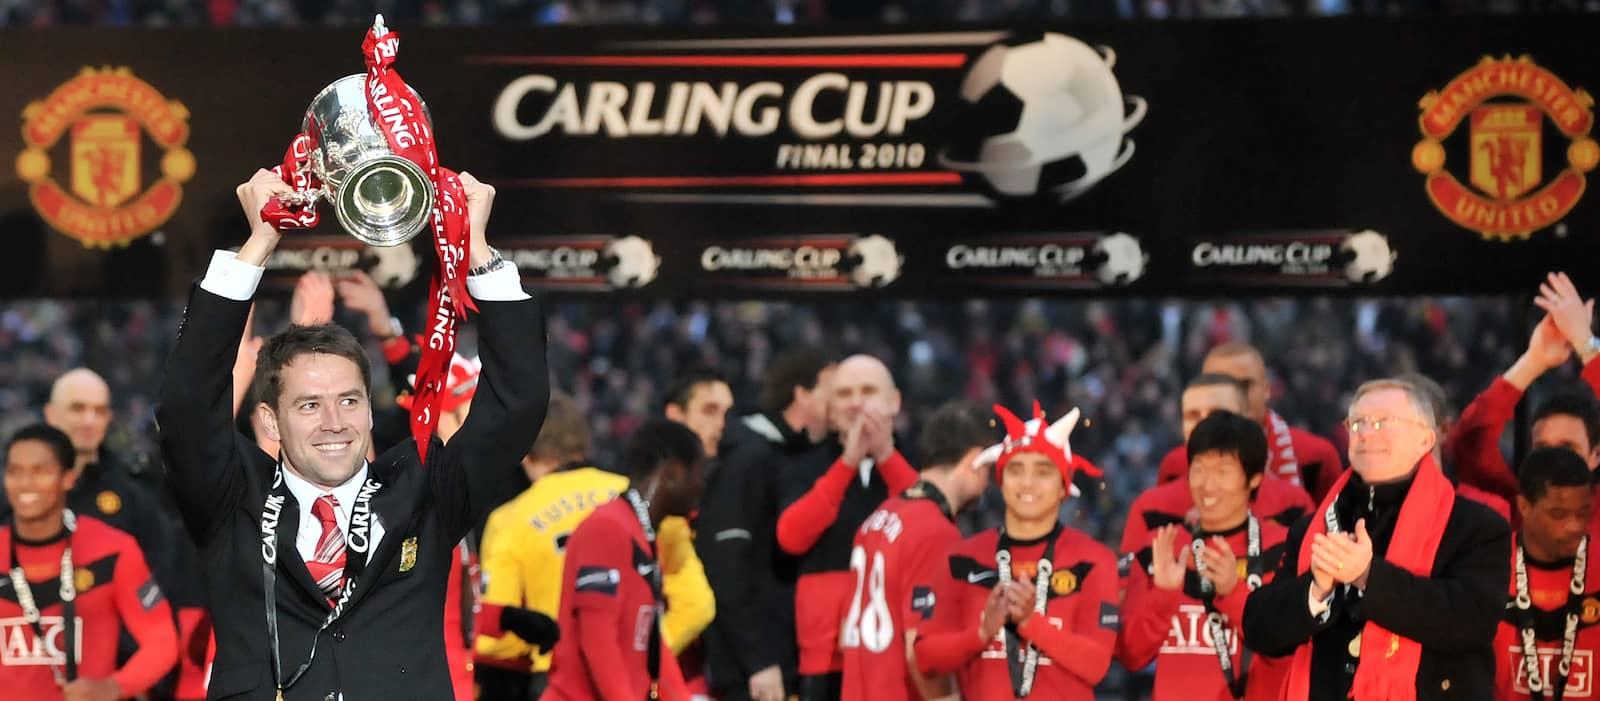 Michael Owen reveals Sir Alex Ferguson wanted to sign Karim Benzema instead of him